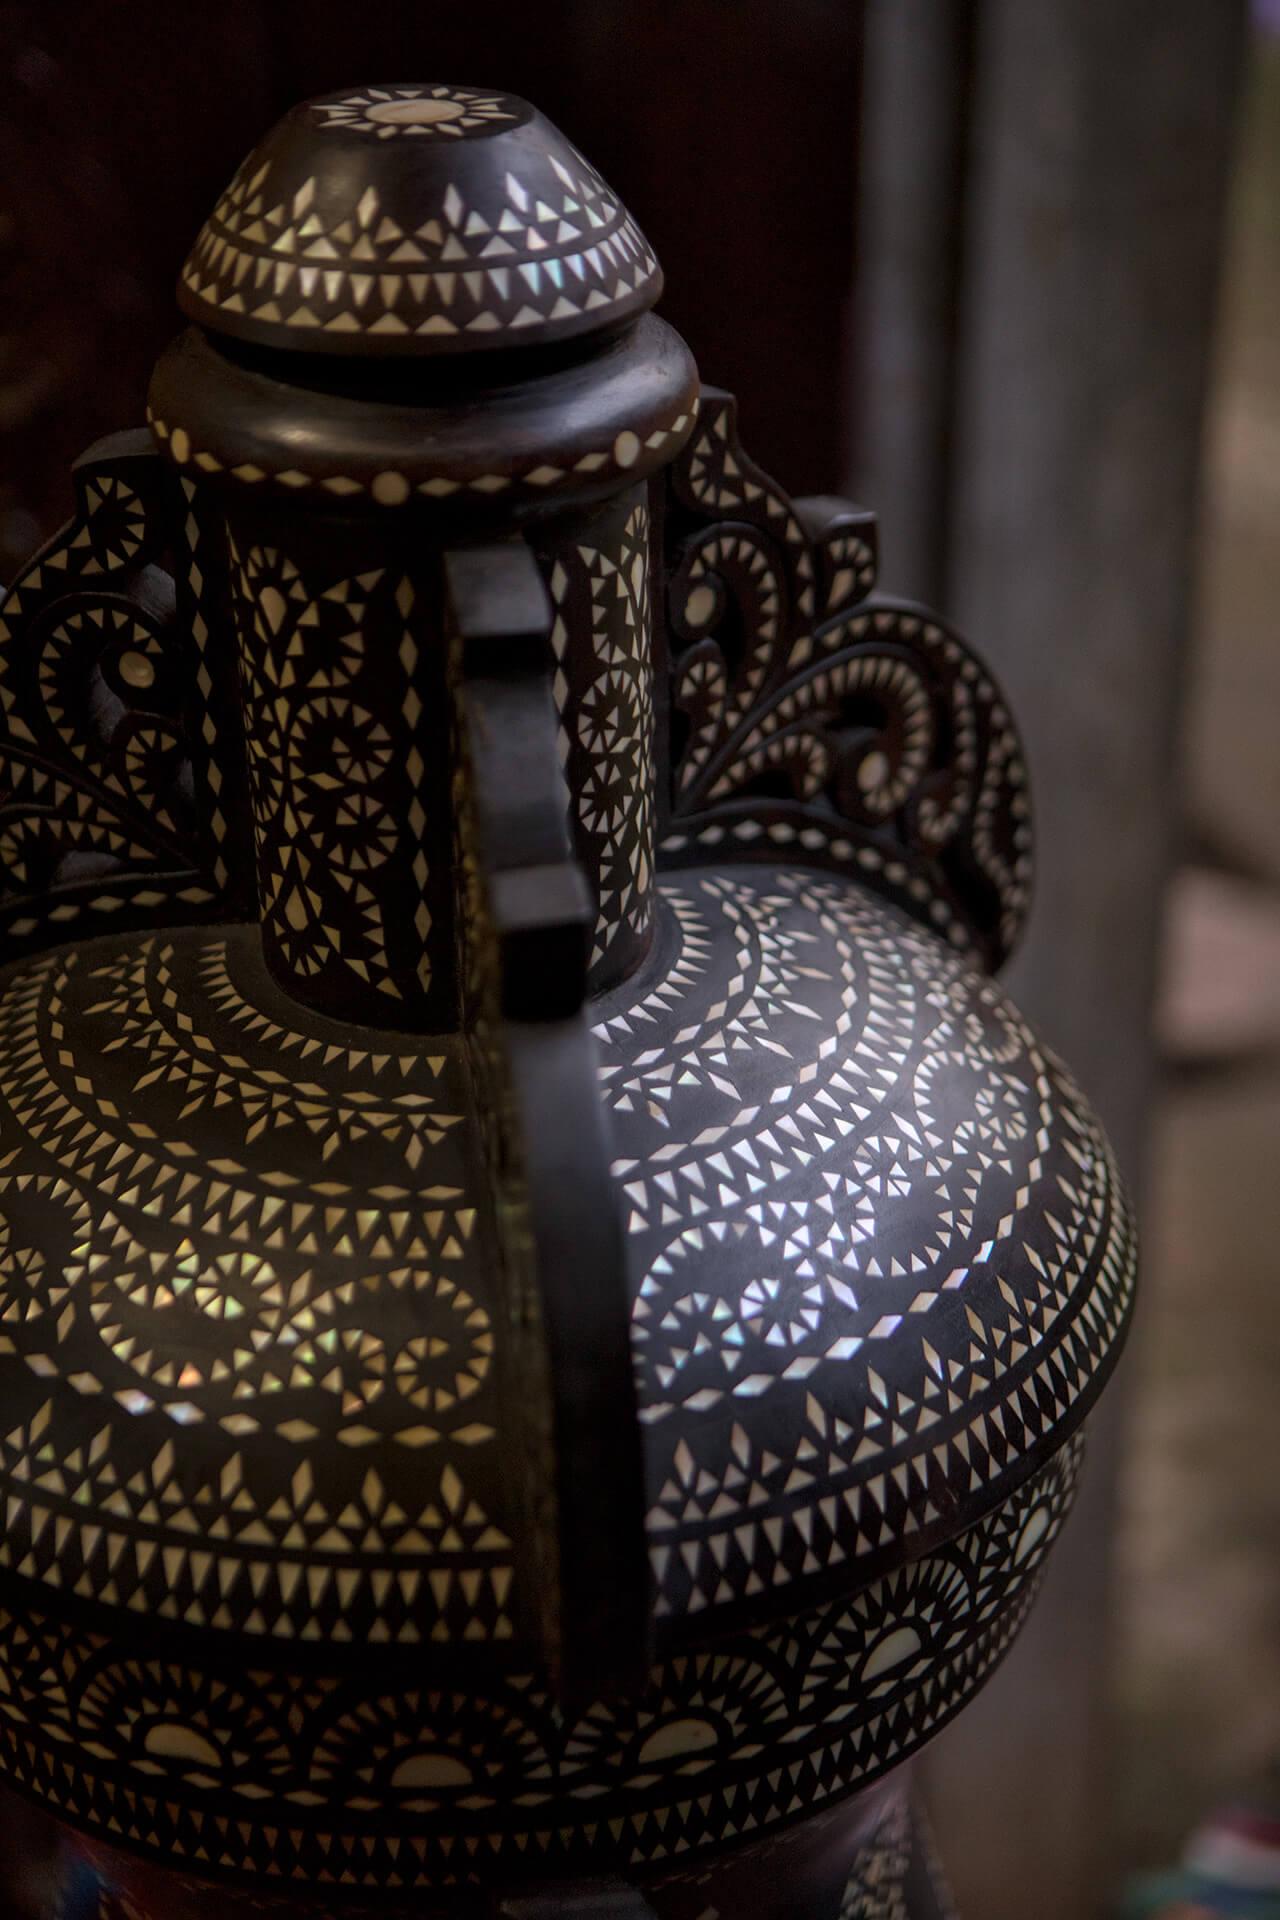 Intricate okir patterns in capiz on a vase